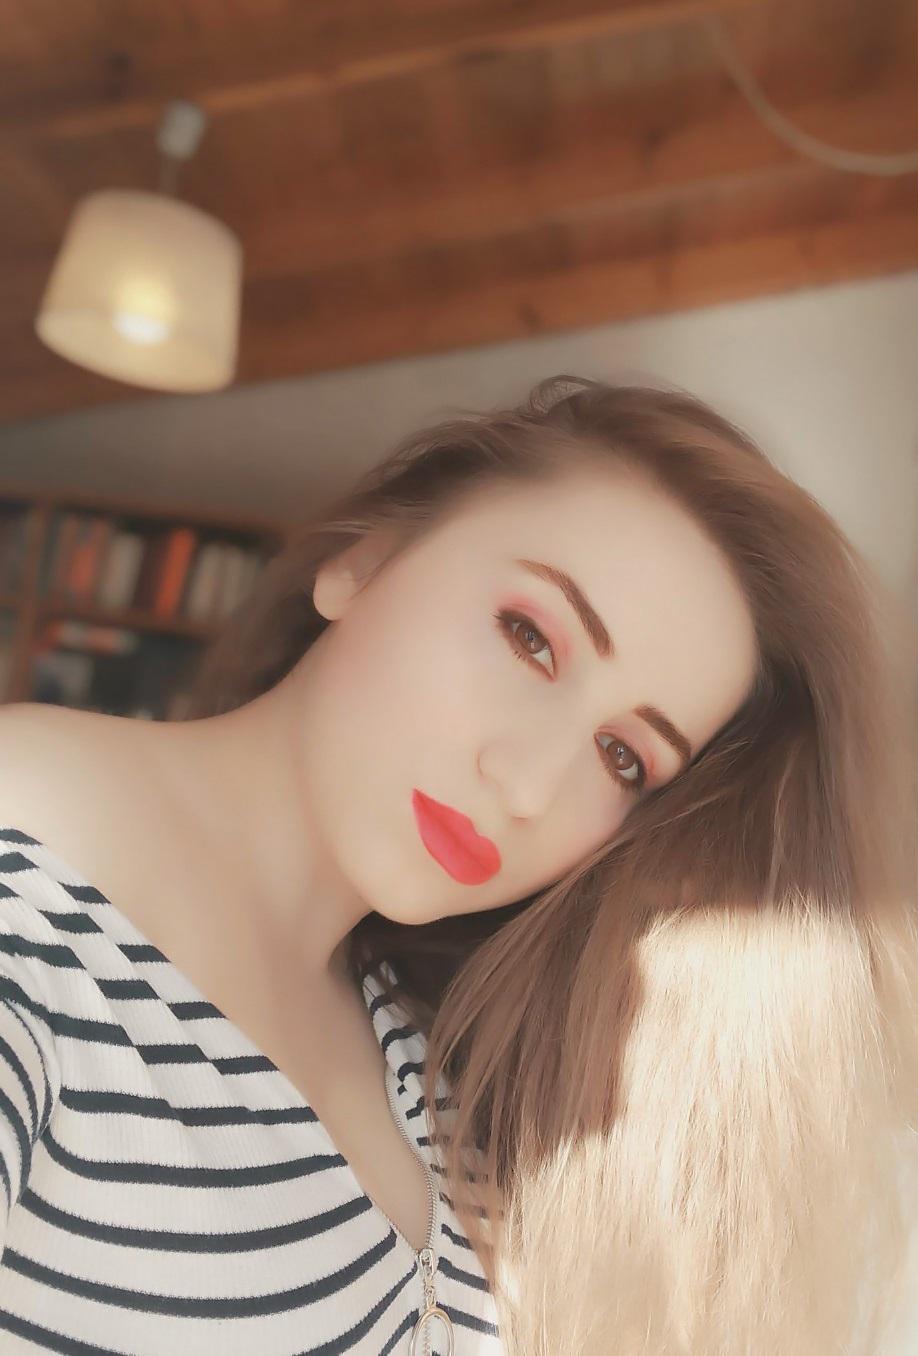 lorena-stroka-foto-biografia-wikipedia-facebook-instagram-street-style-gazetare-kontakt-books-bashkeshorti-kush-eshte-albstroka